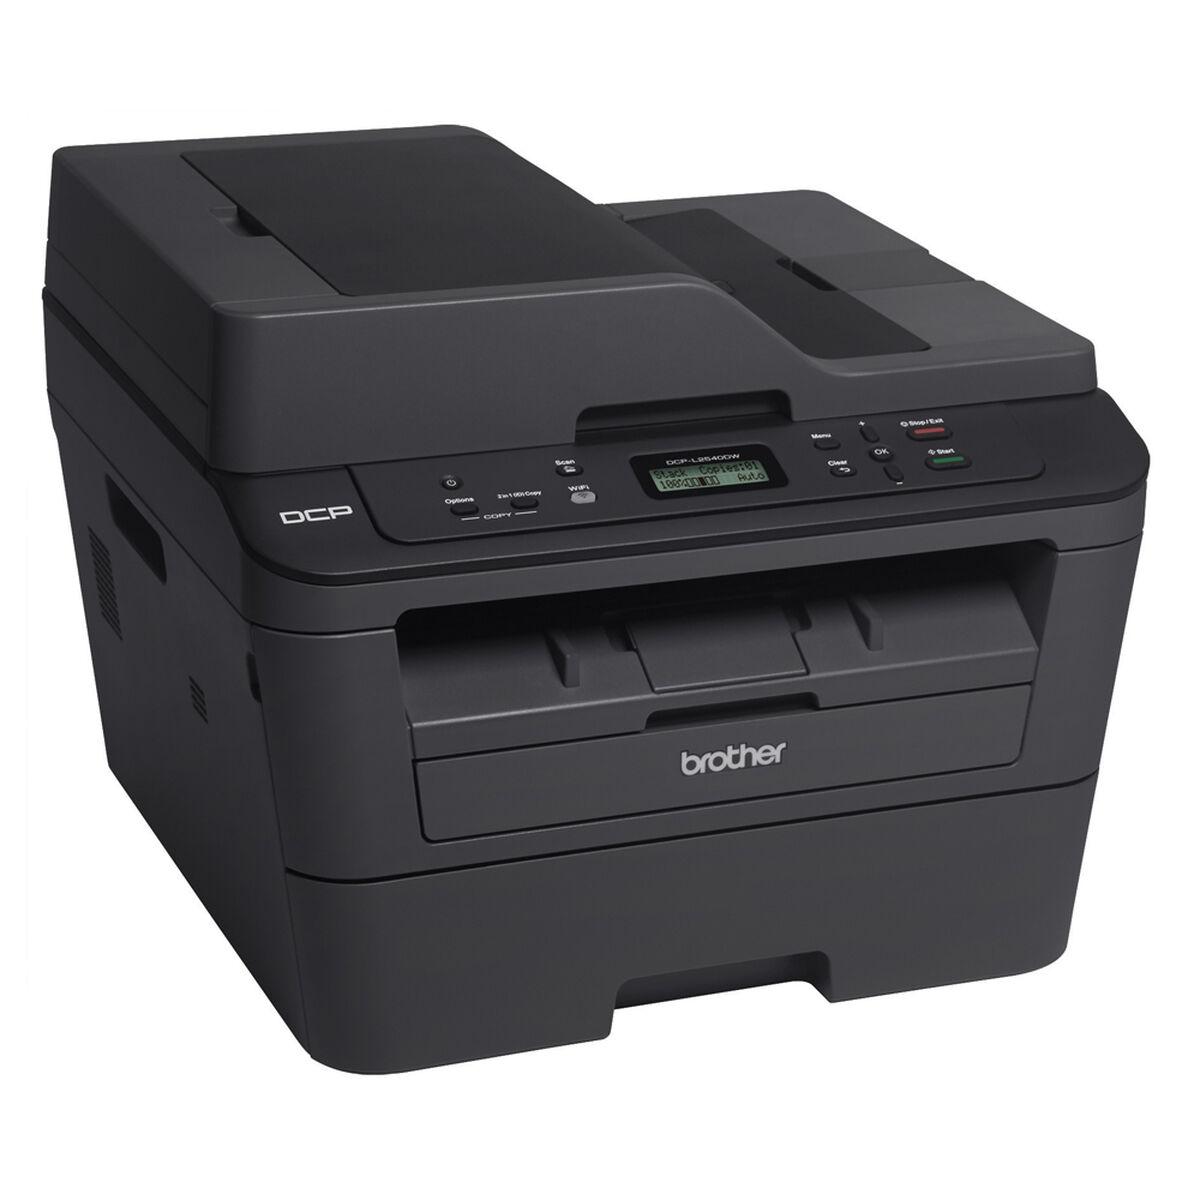 Impresora Brother Láser Monocromática DCP-L2540D